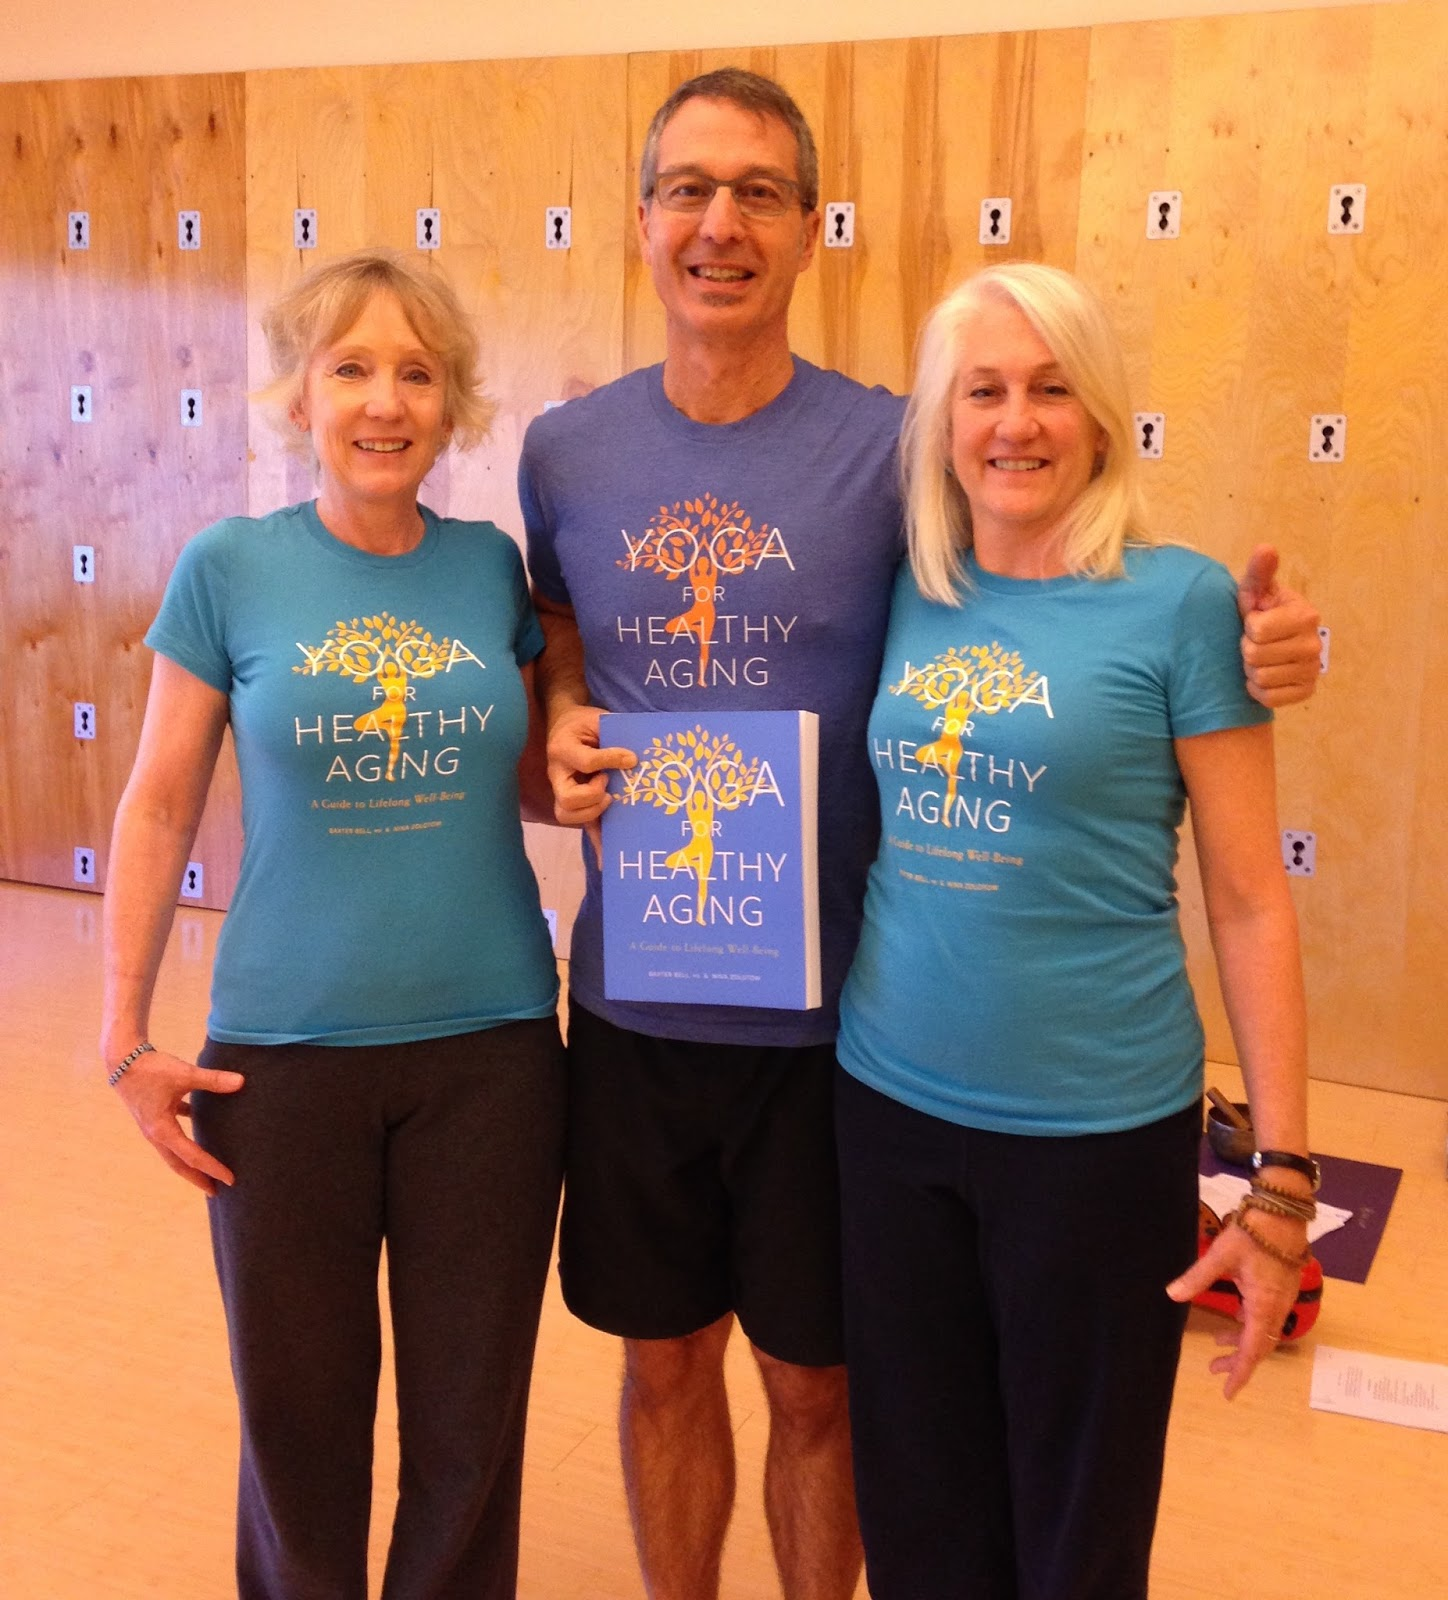 Yoga For Healthy Aging Yoga For Healthy Aging T Shirts